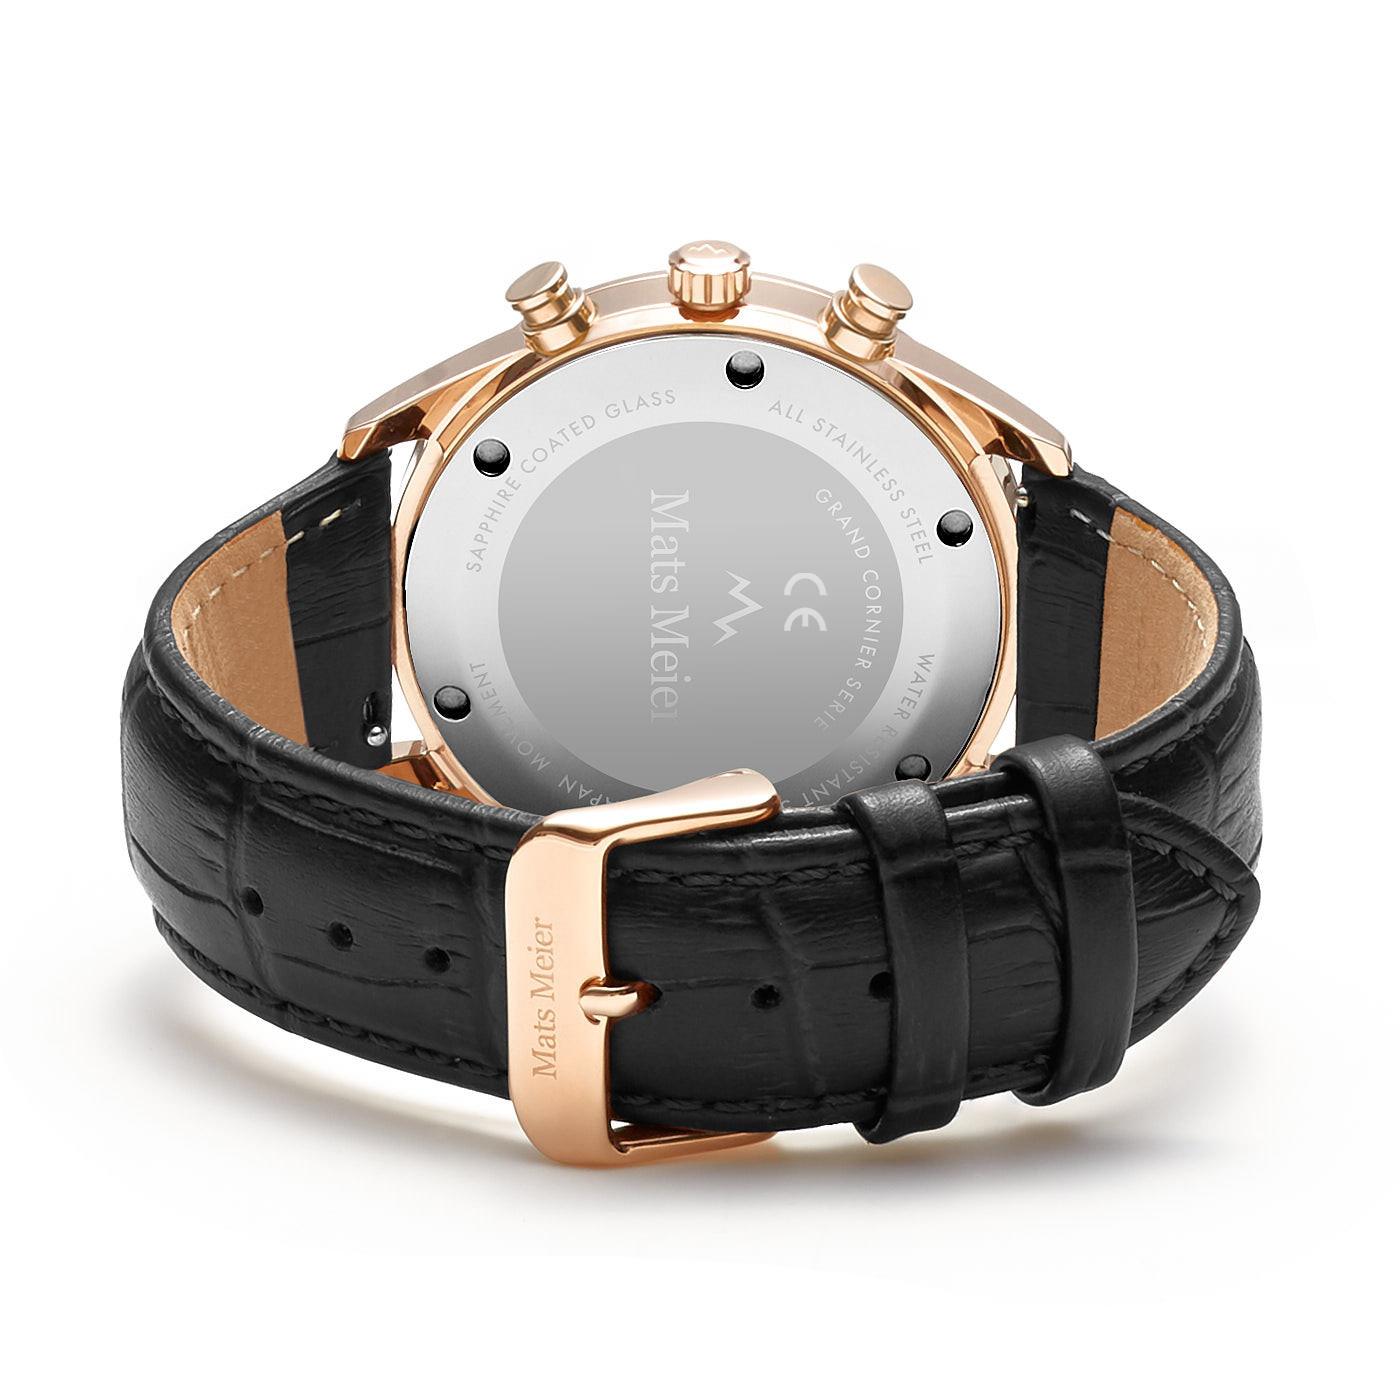 Mats Meier Grand Cornier chronograaf herenhorloge zwart en rosé goudkleurig